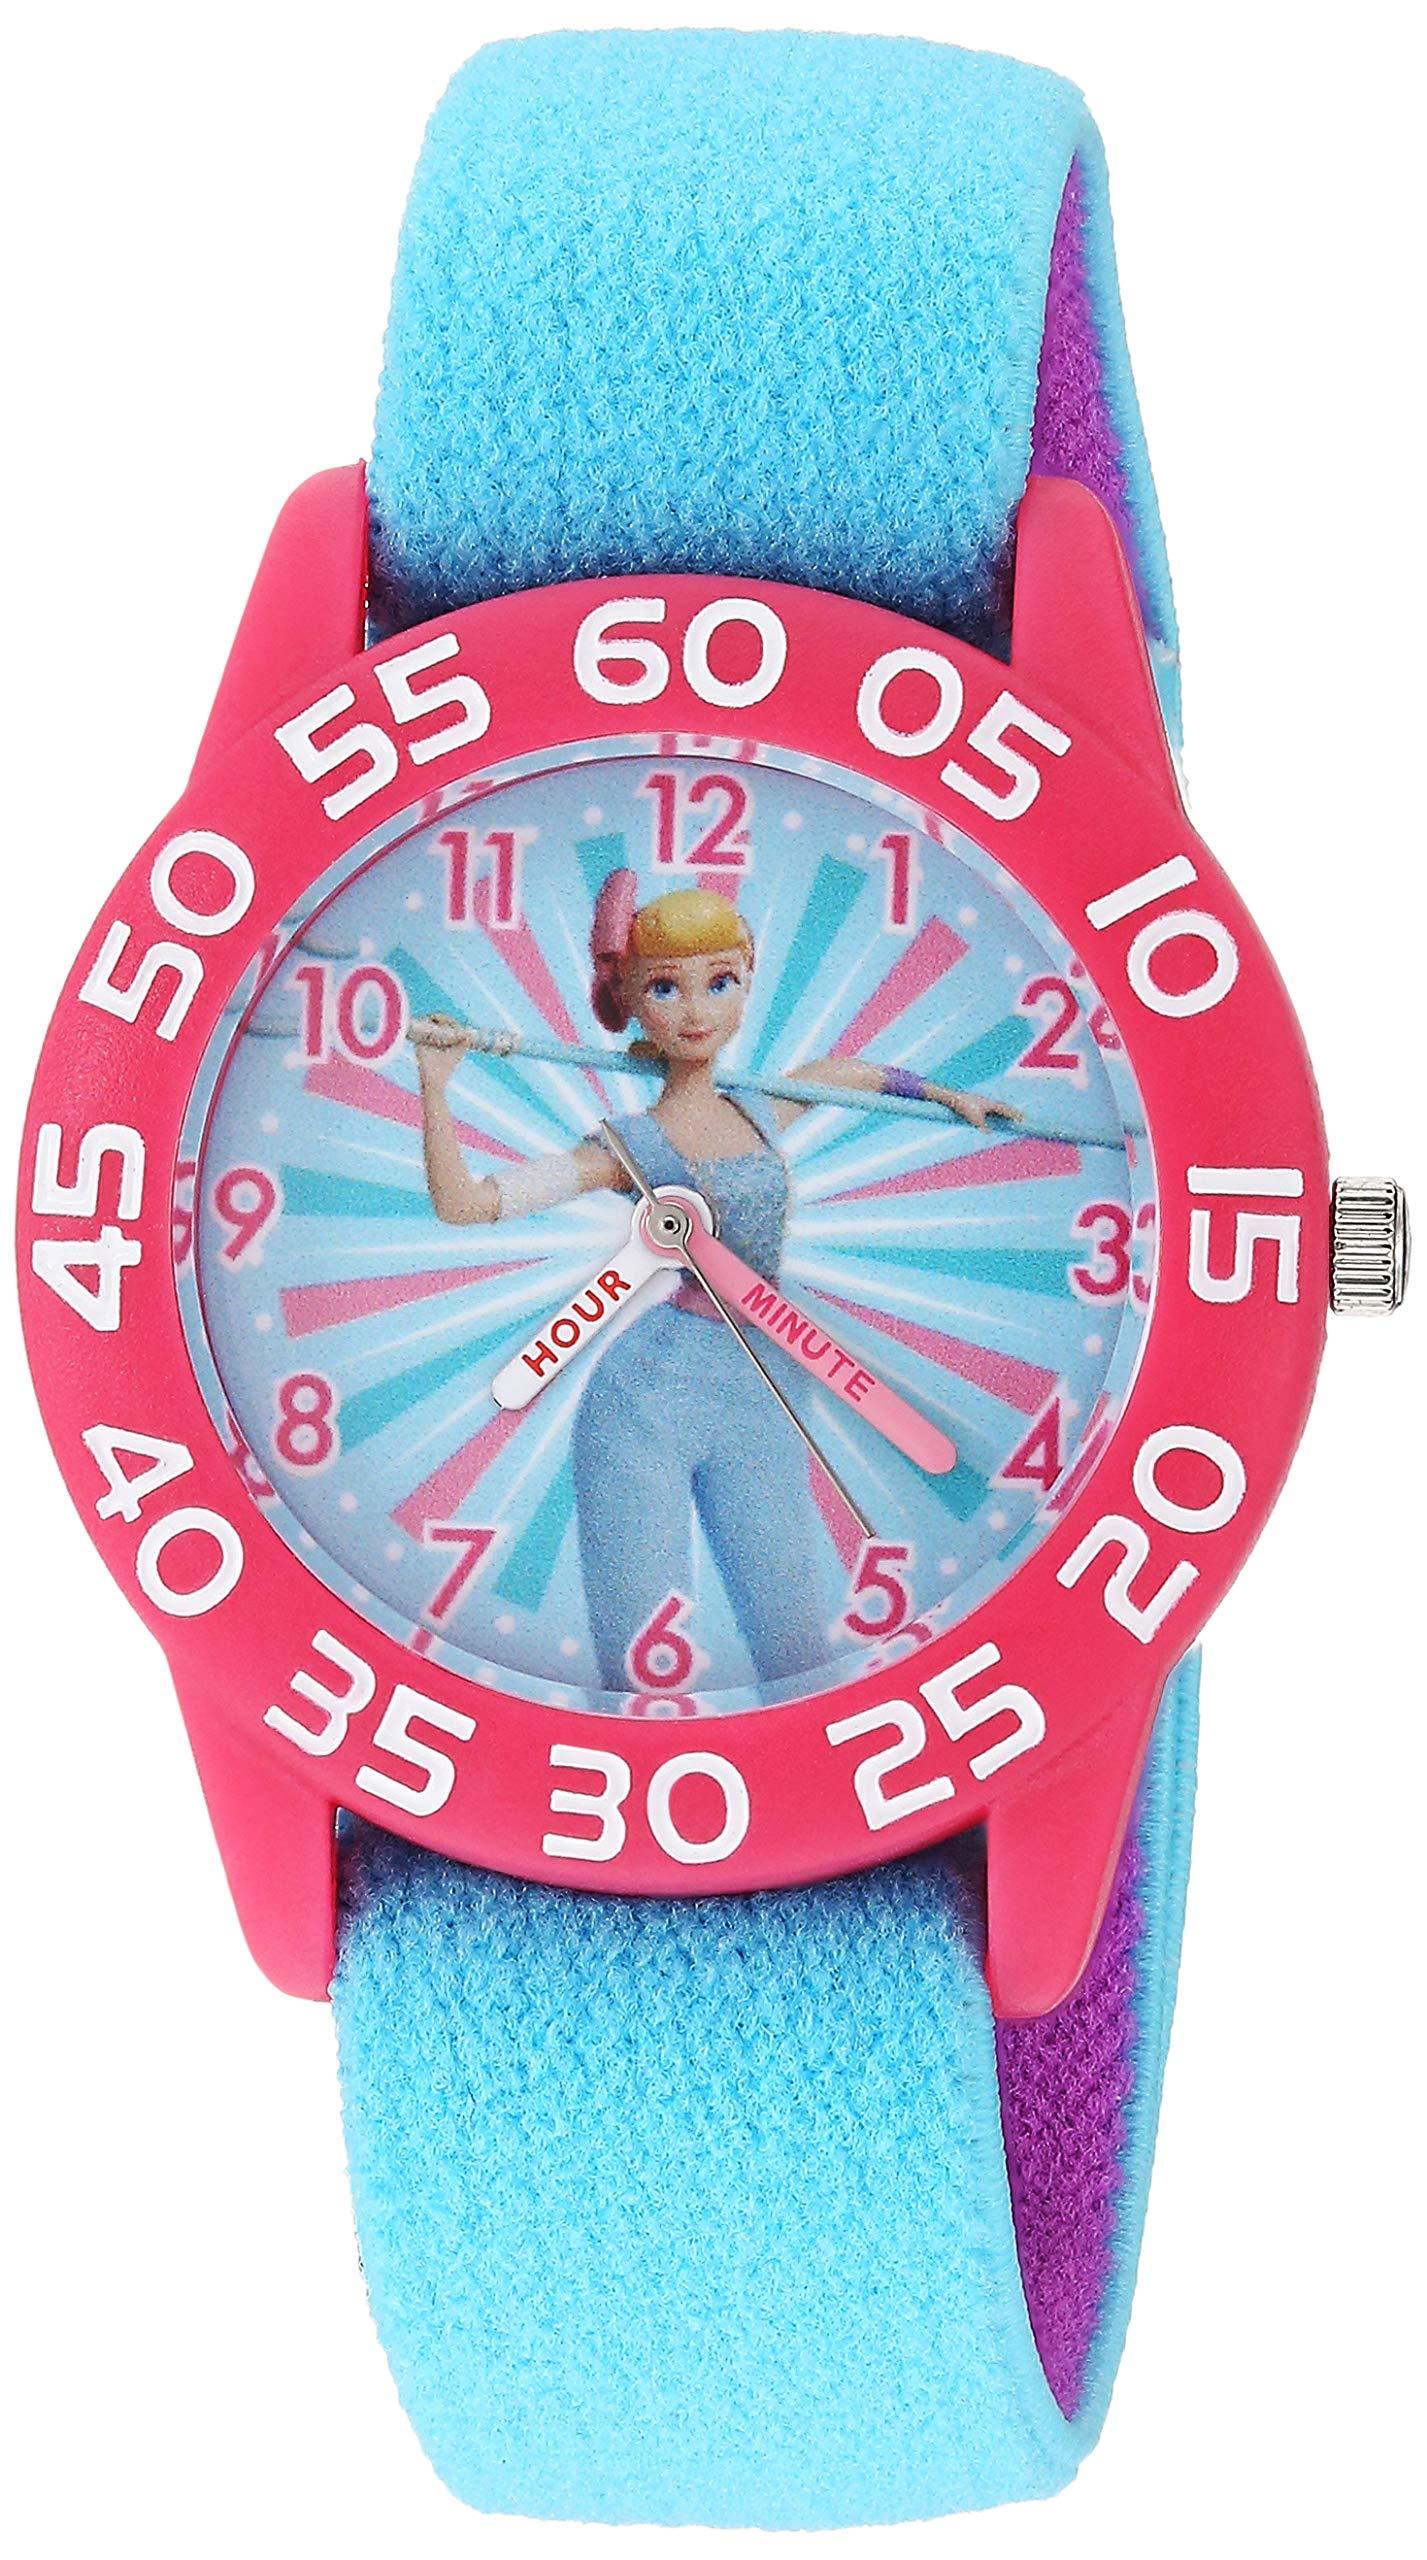 Disney Girls Toy Story 4 Analog-Quartz Watch with Nylon Strap, Blue, 16 (Model: WDS000700) by Disney